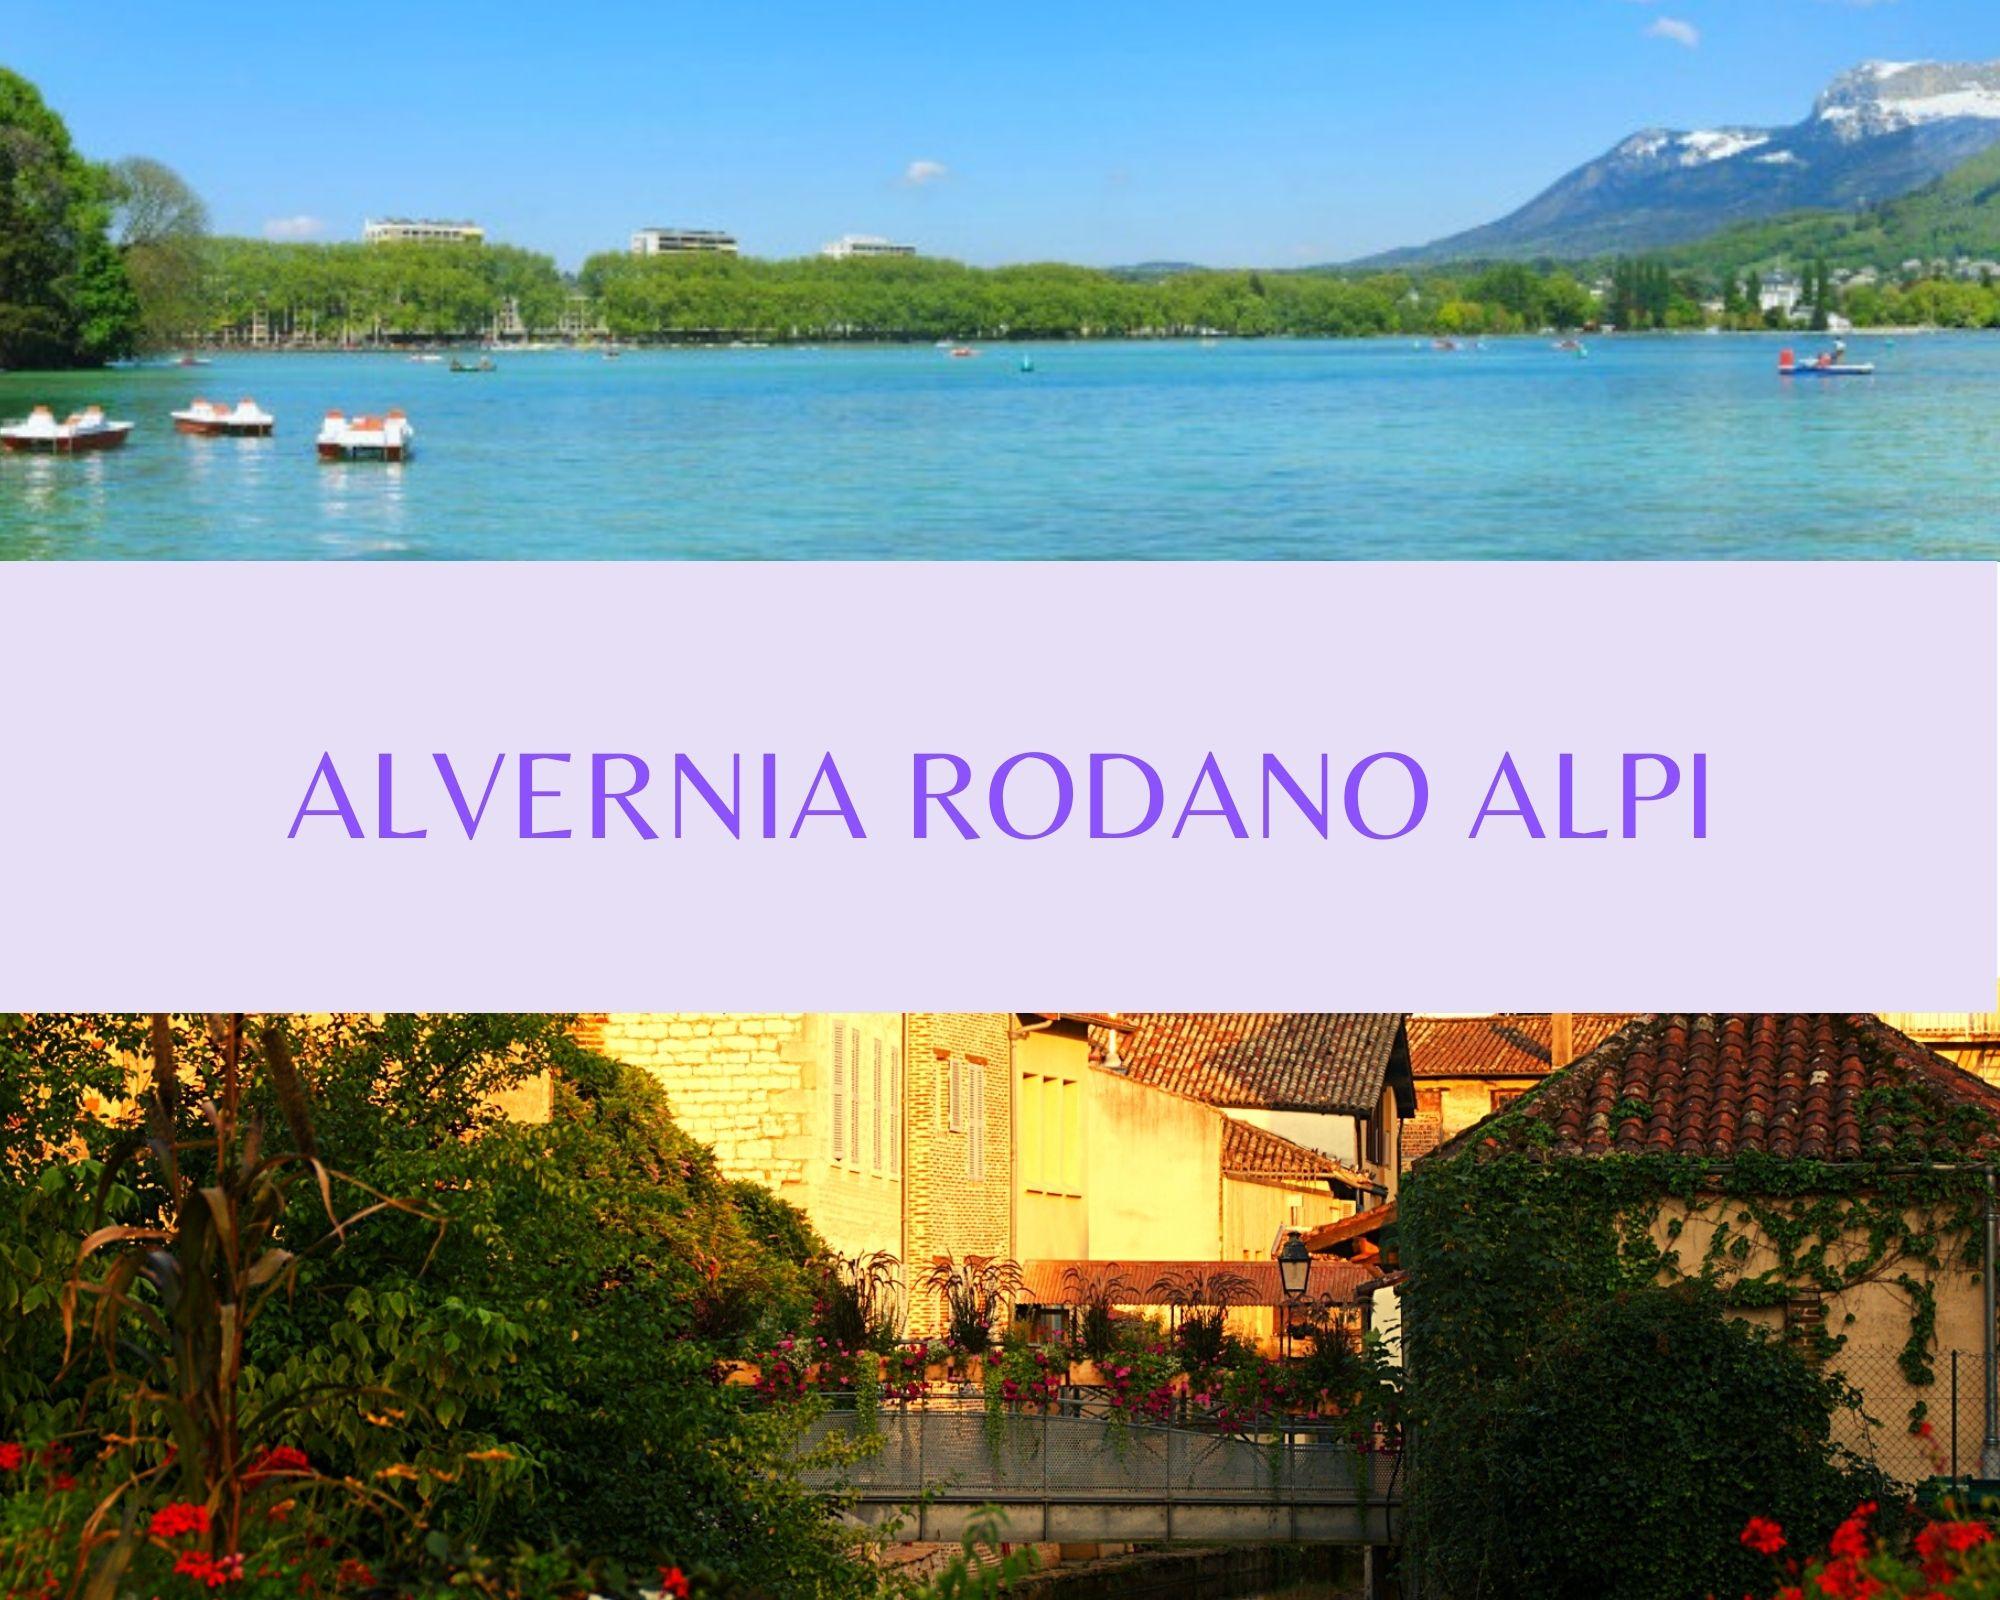 Alvernia Rodano Alpi